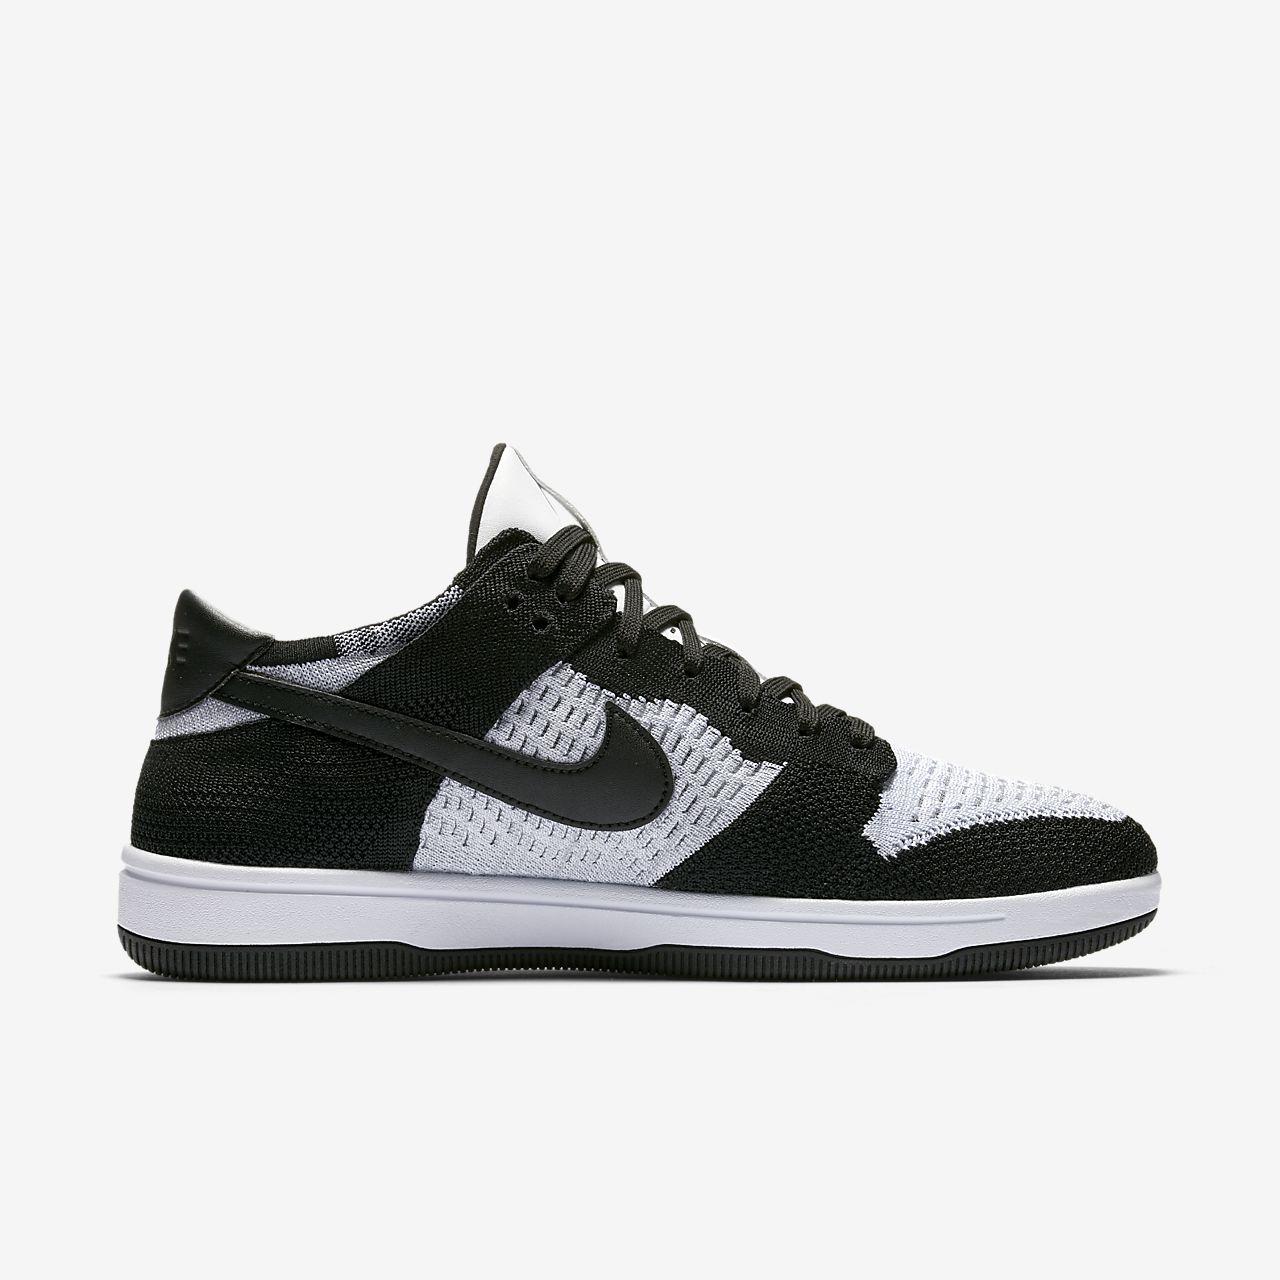 Nike Dunk High Tops Kids Black Apple Logo Nike USA TrainersConvenient